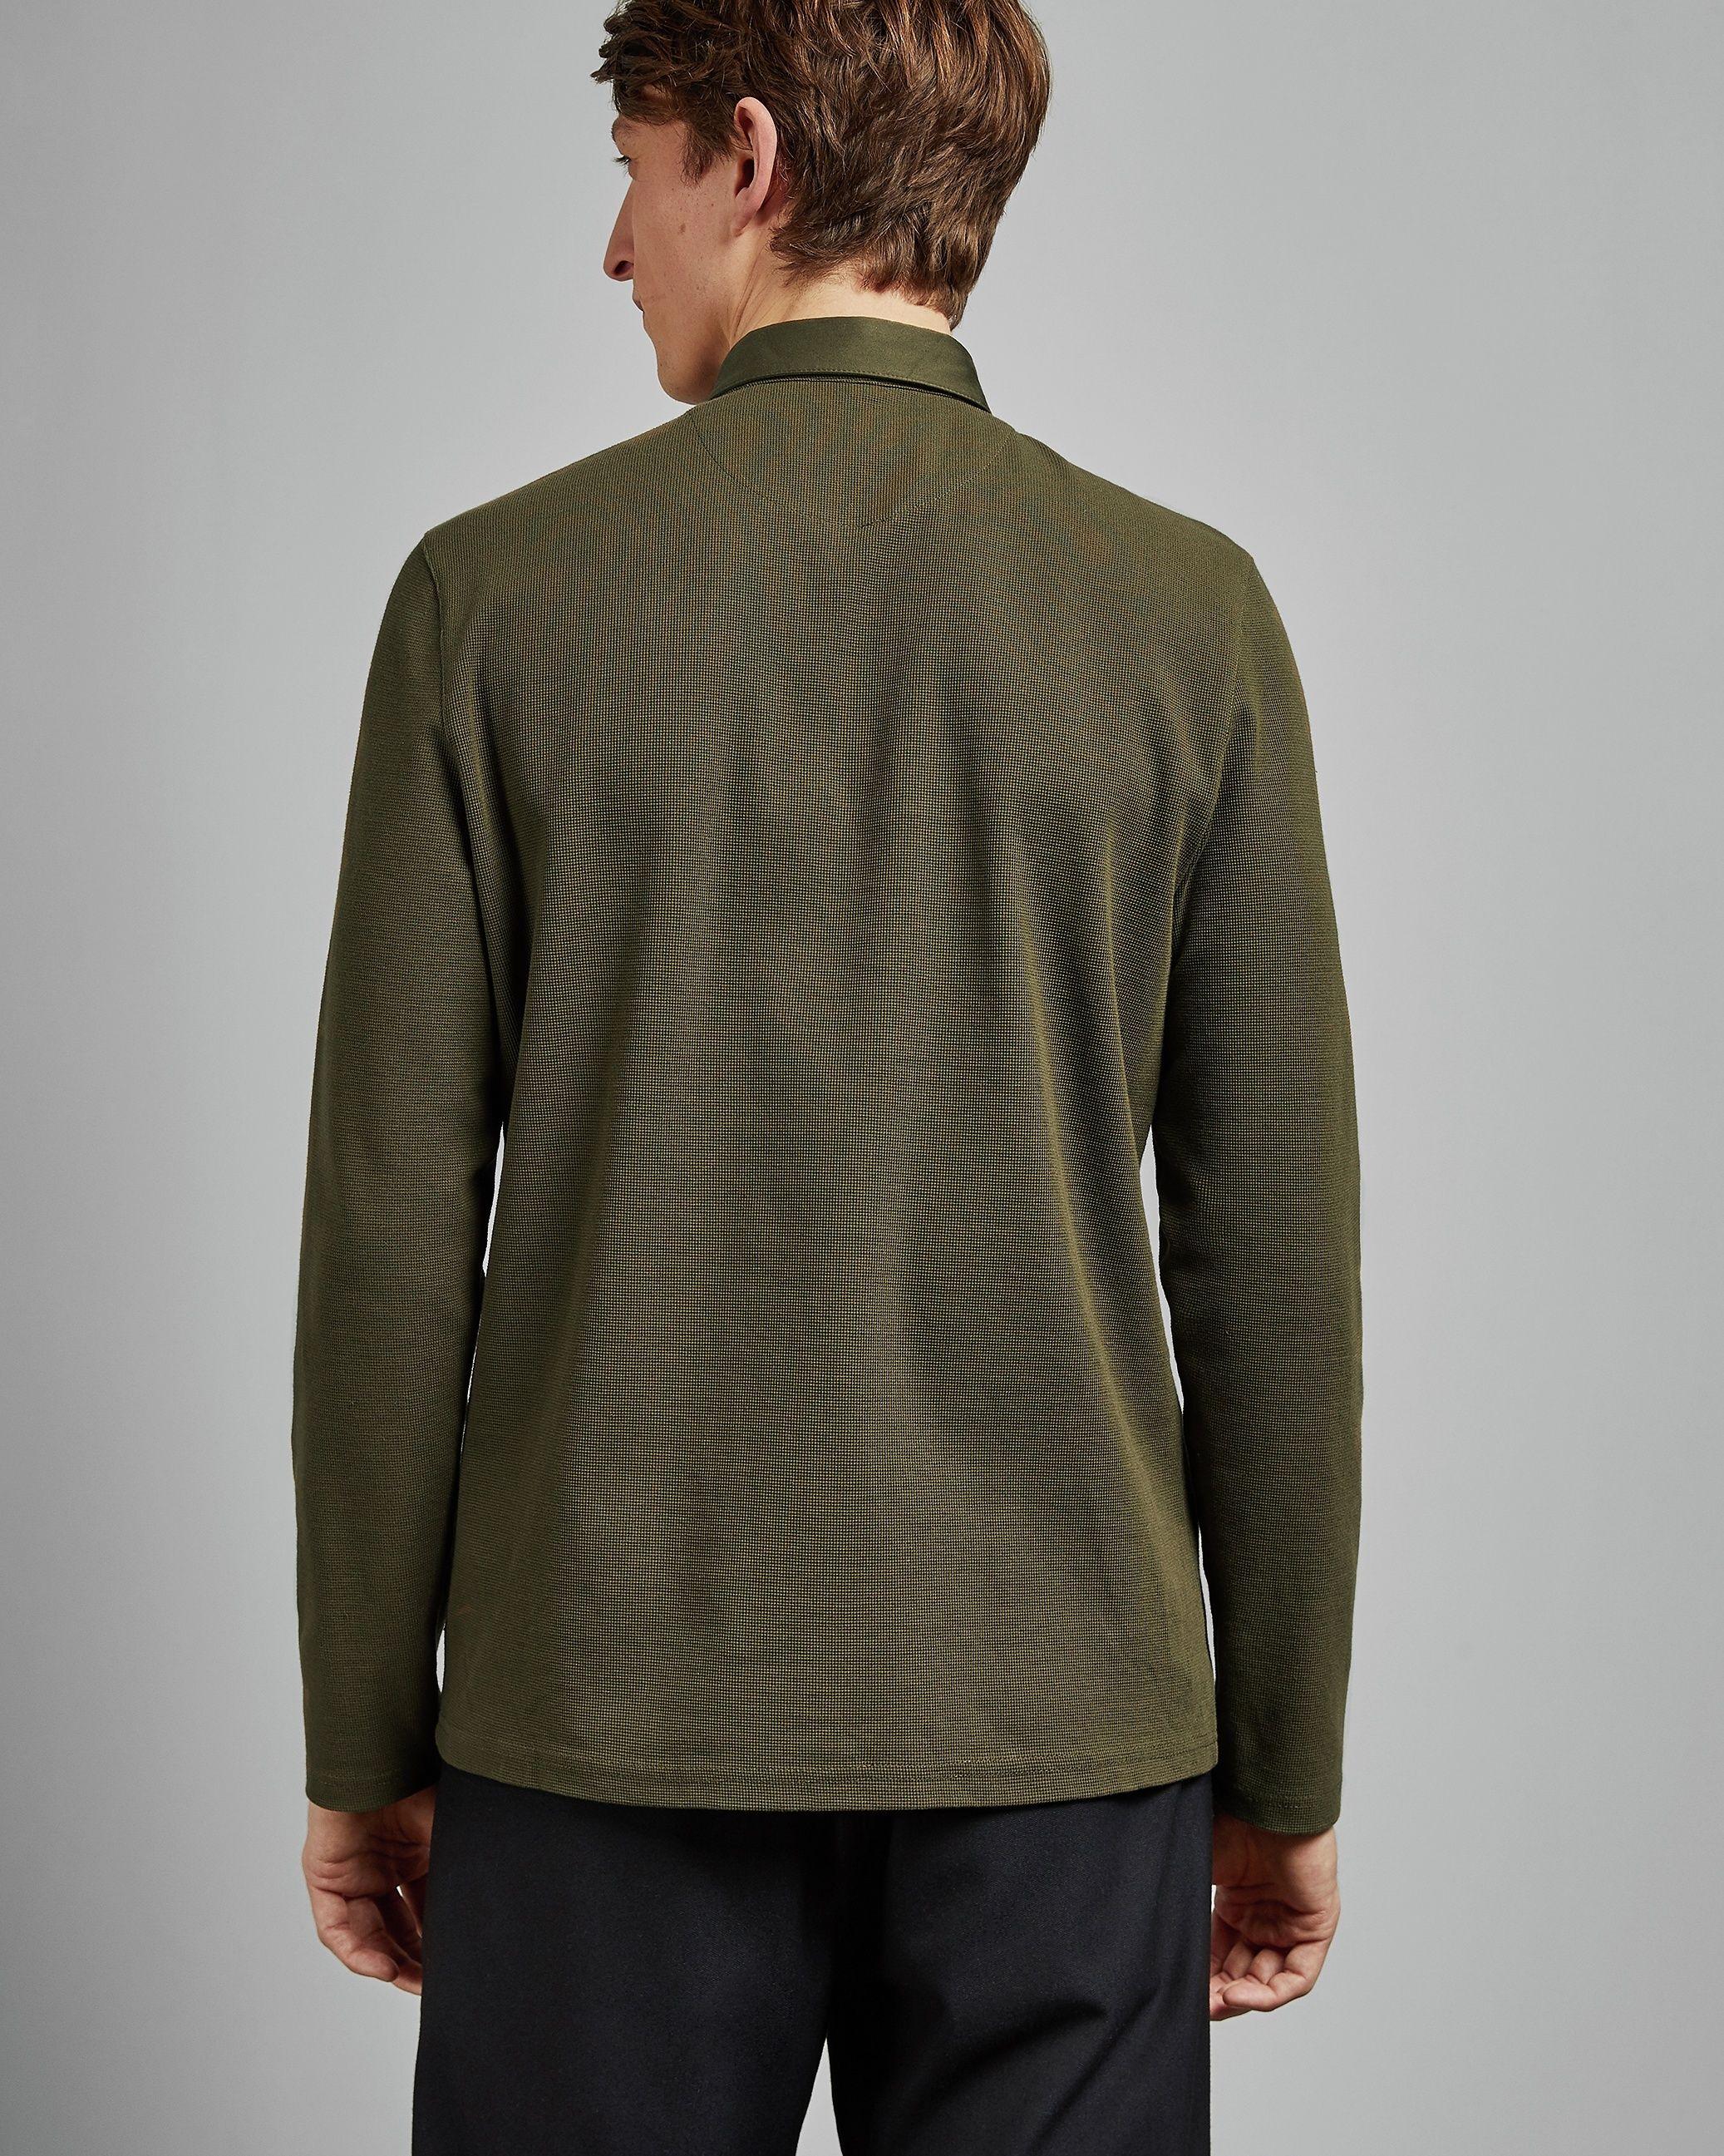 Ted Baker Leopard Long-Sleeved Textured Woven Collar Polo, Khaki